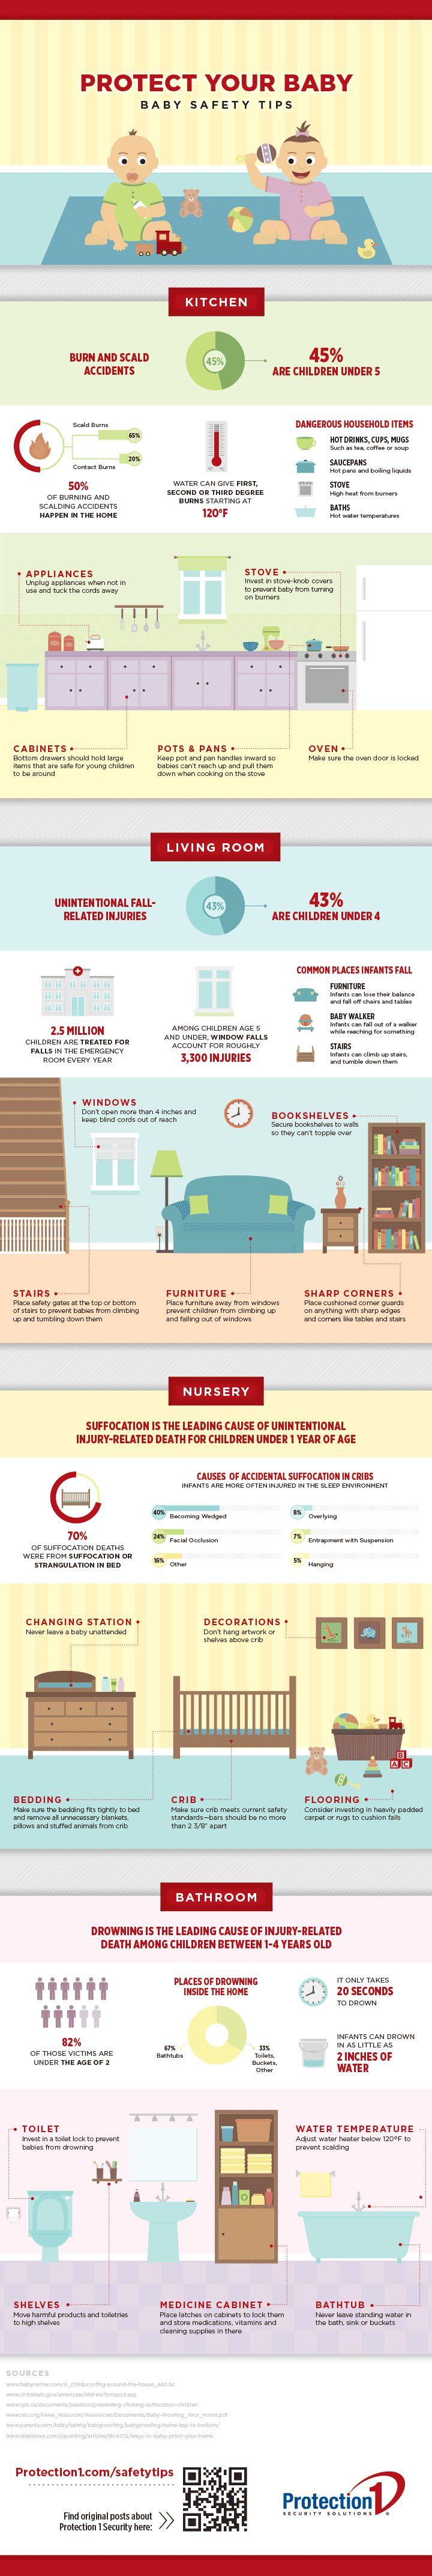 Child Safety Tips for Infant Safety